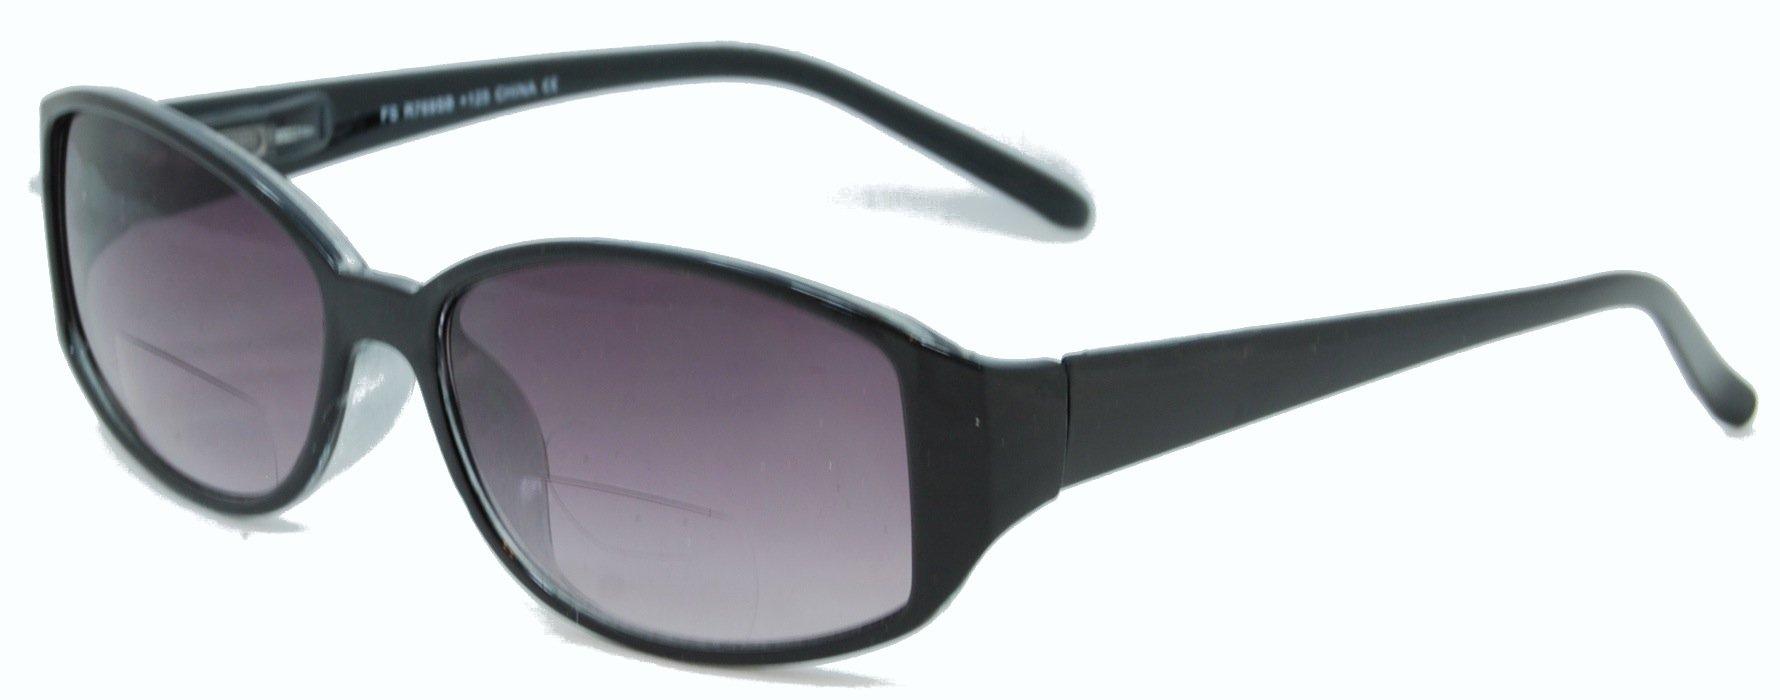 In Style Eyes Stylish Bifocal Sunglasses Black 2.75